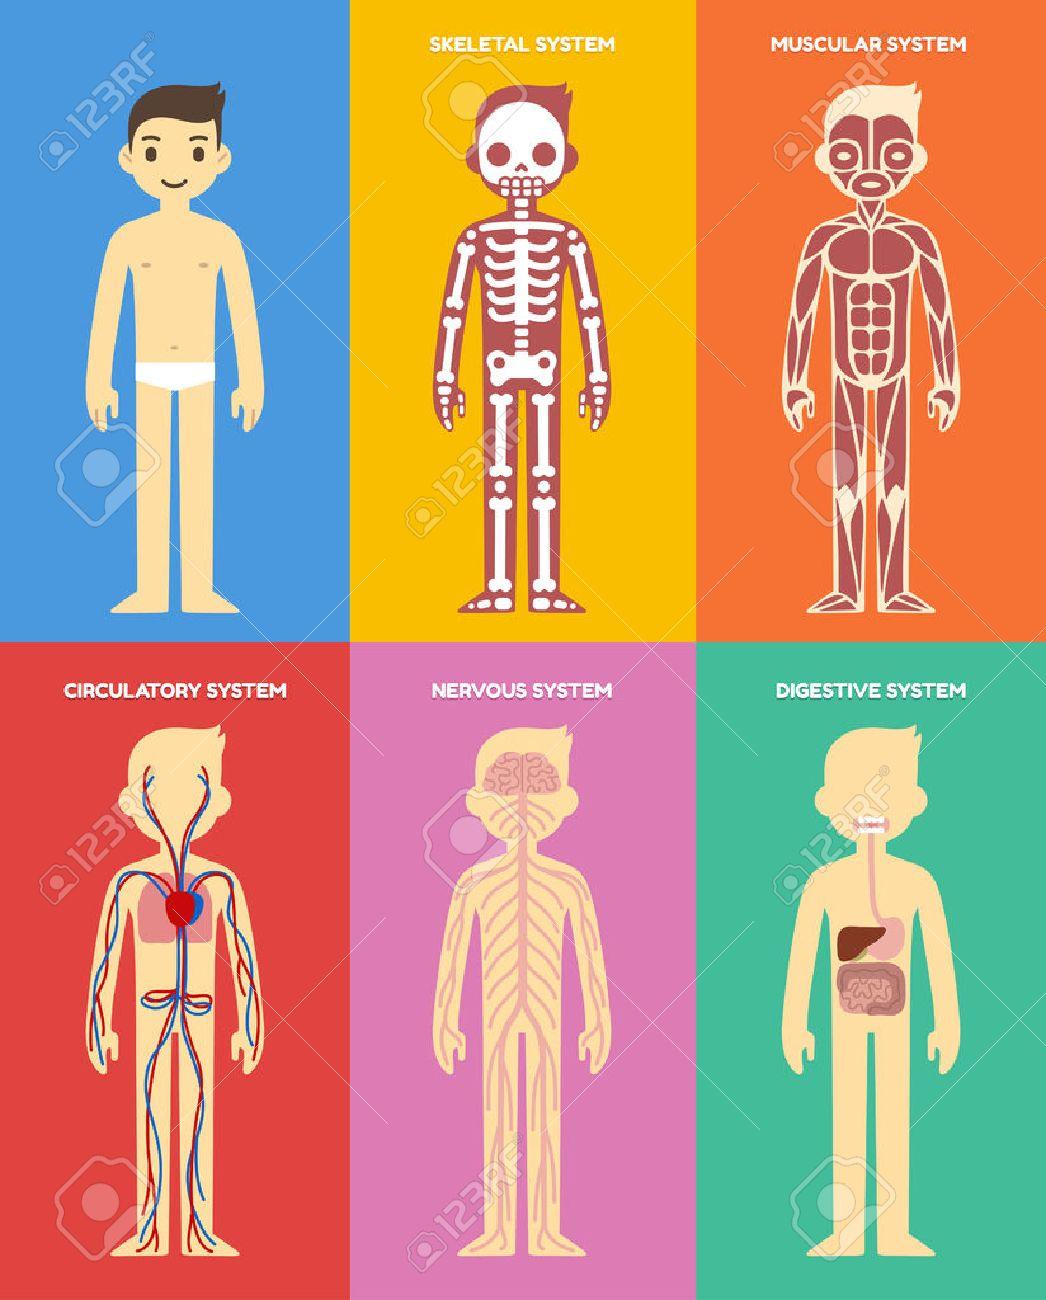 Stylized Human Body Anatomy Chart: Skeletal, Muscular, Circulatory ...